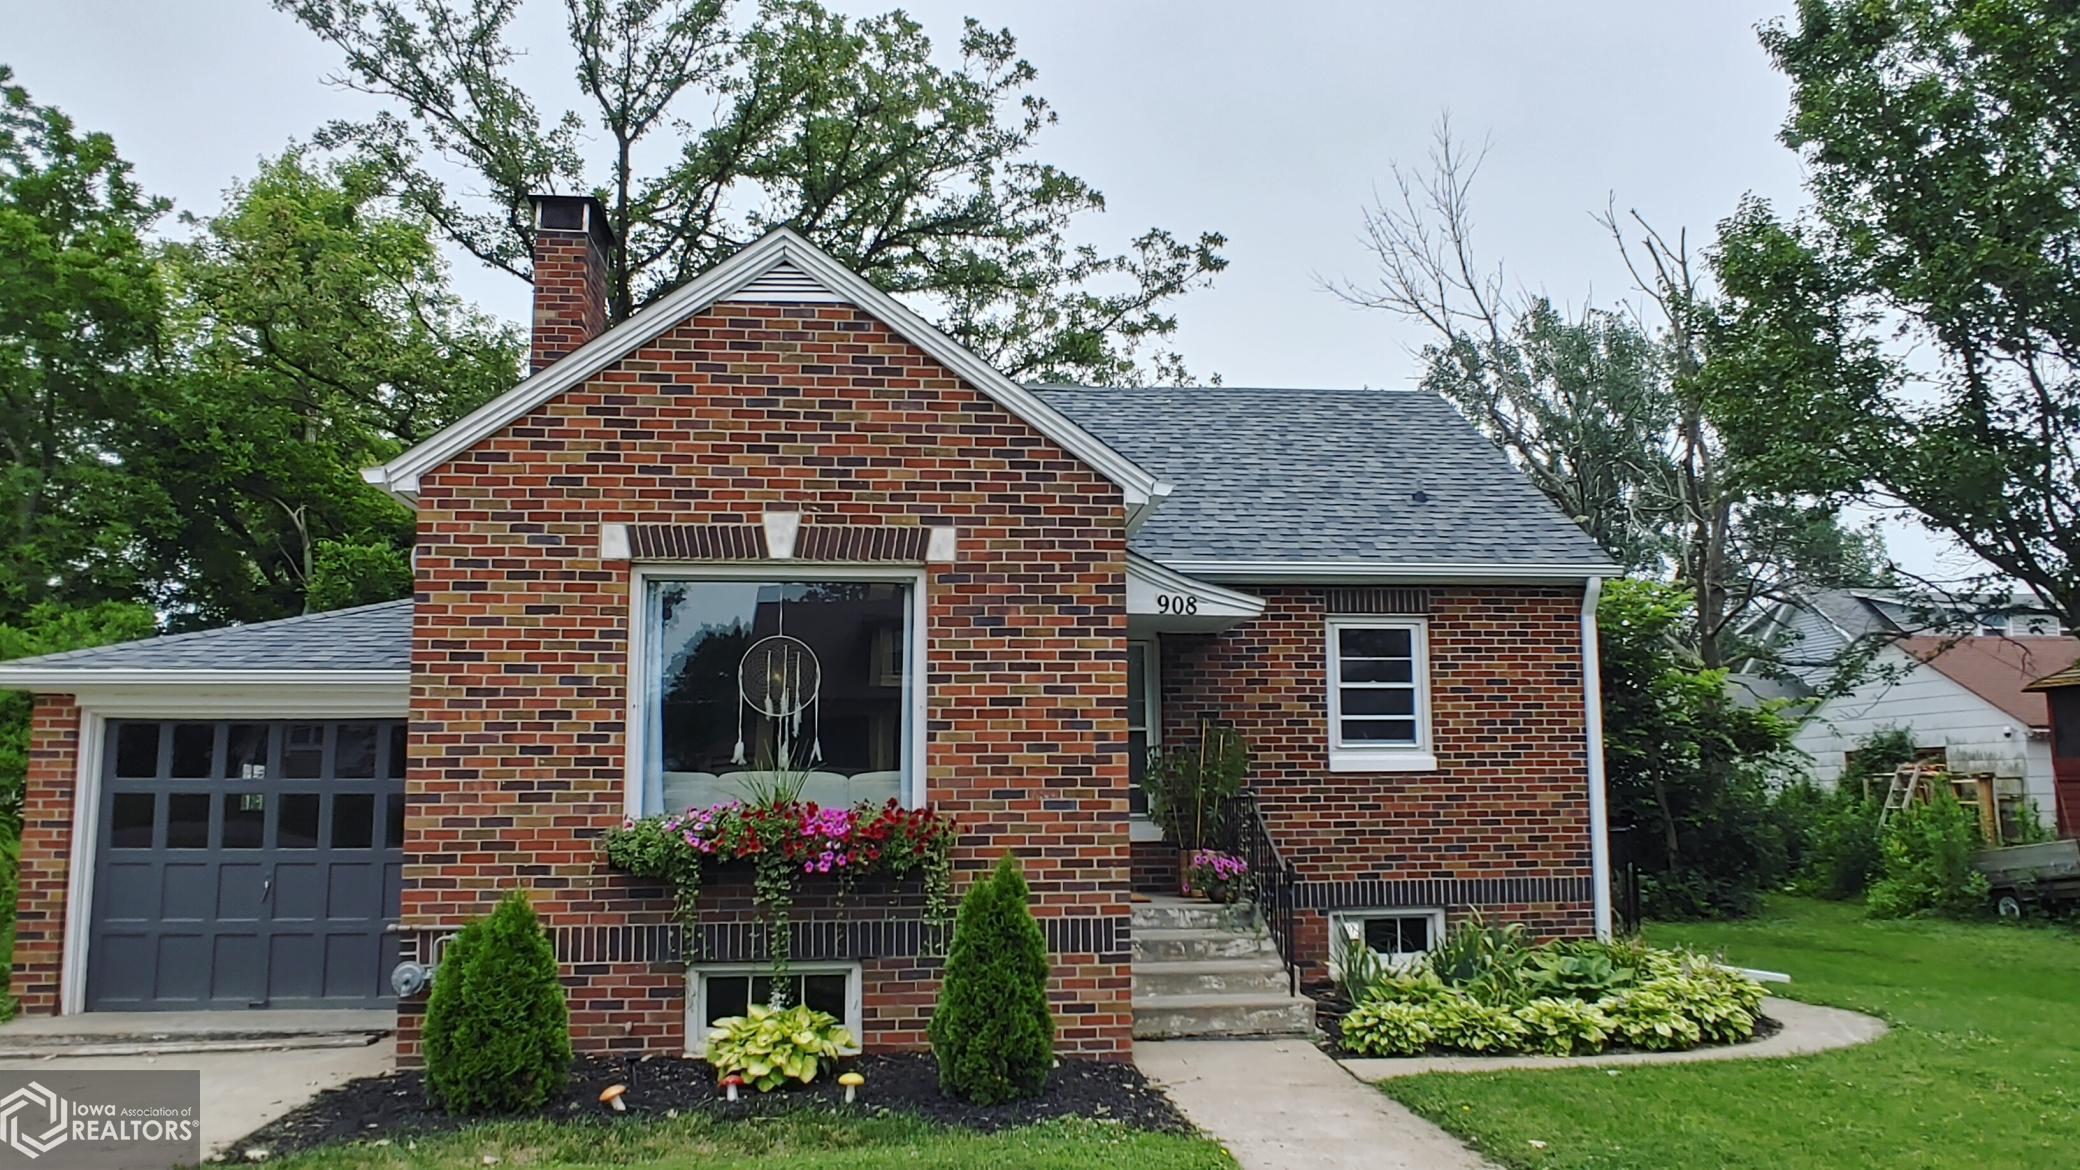 908 Elm, Grinnell, Iowa 50112-2035, 3 Bedrooms Bedrooms, ,1 BathroomBathrooms,Single Family,For Sale,Elm,6024297